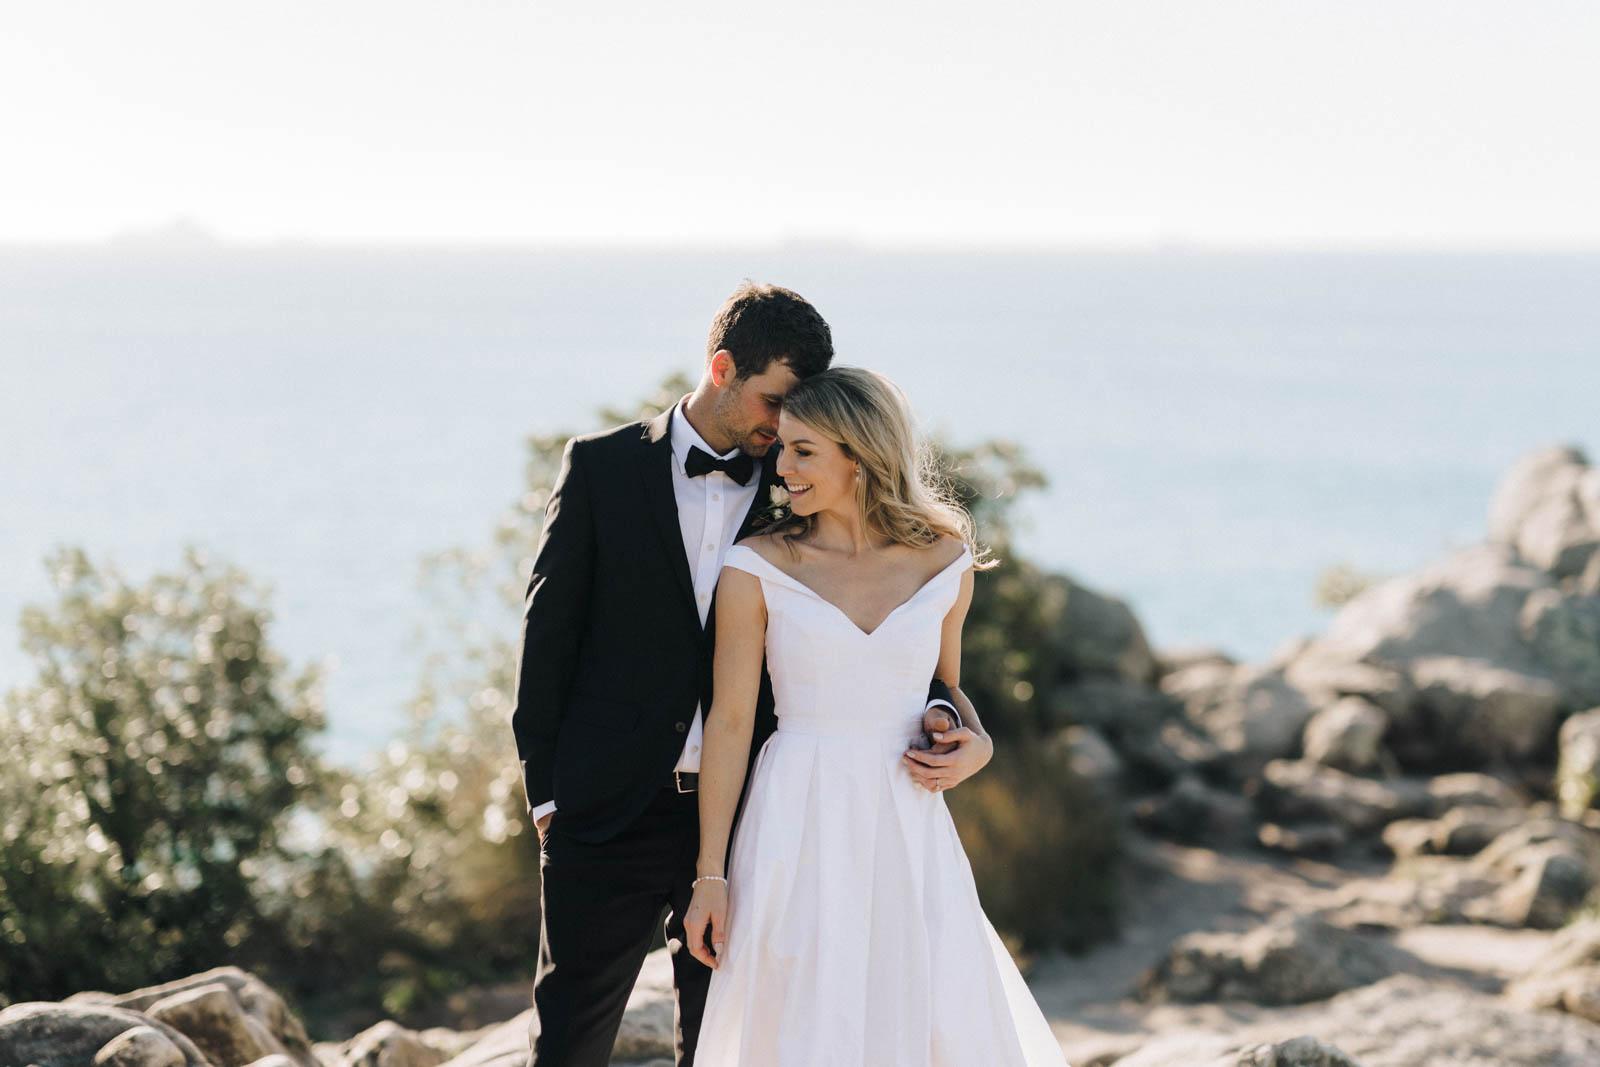 newfound-s-p-mt-maunganui-tauranga-wedding-photographer-1558-A9_05661